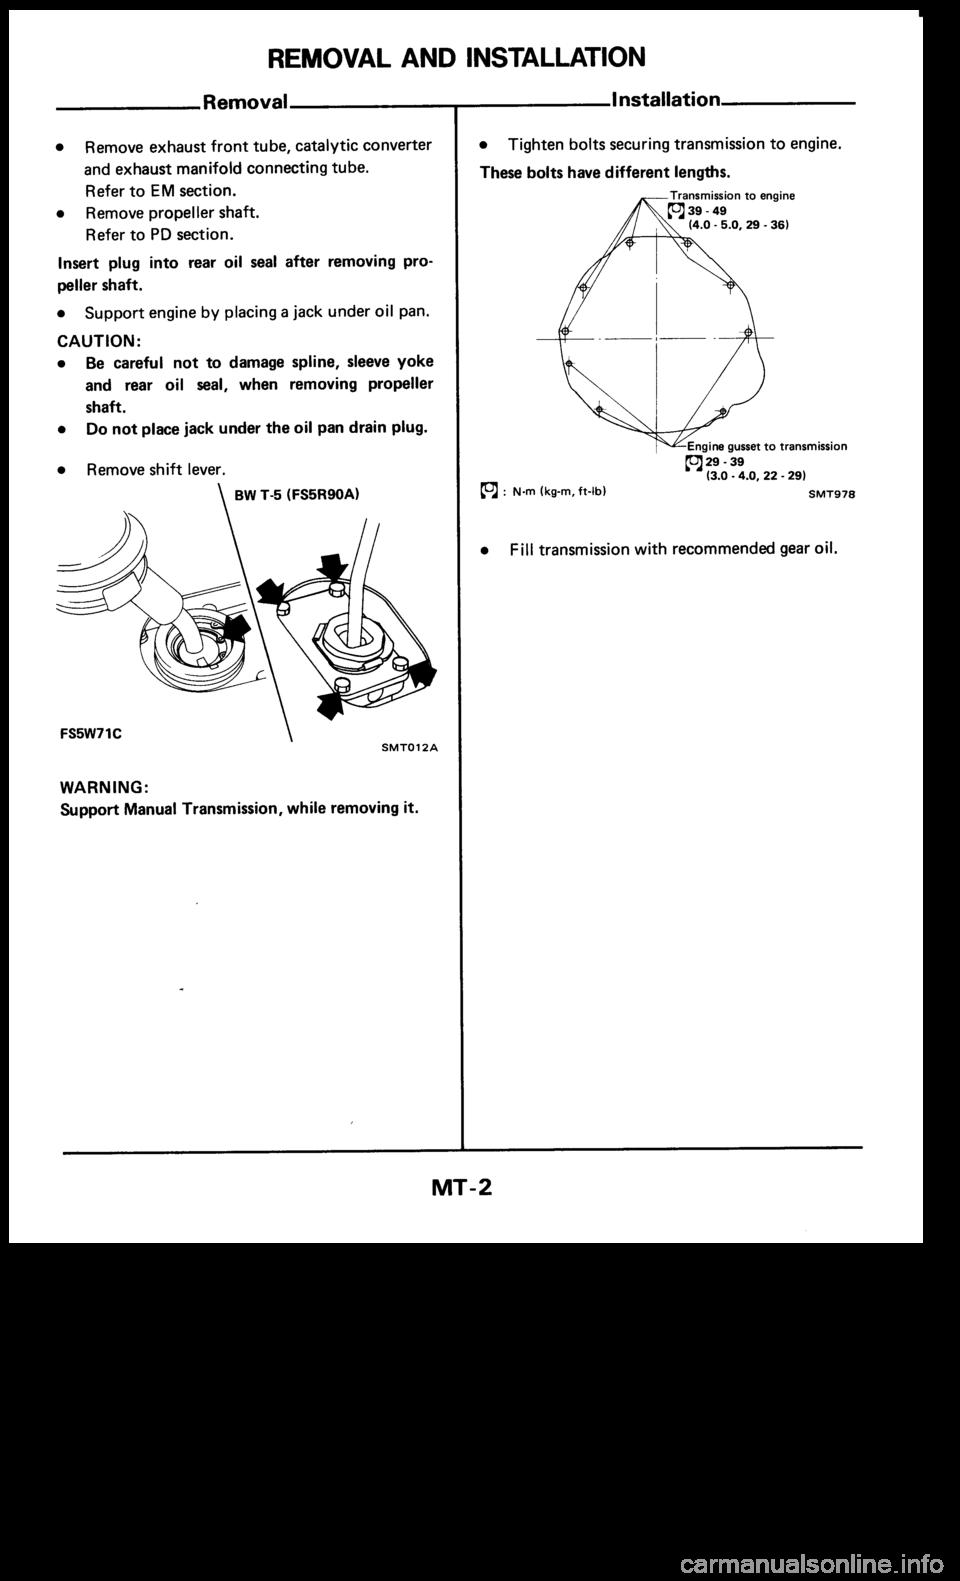 Nissan Altima Cat Converter Location Free Download Wiring Diagram